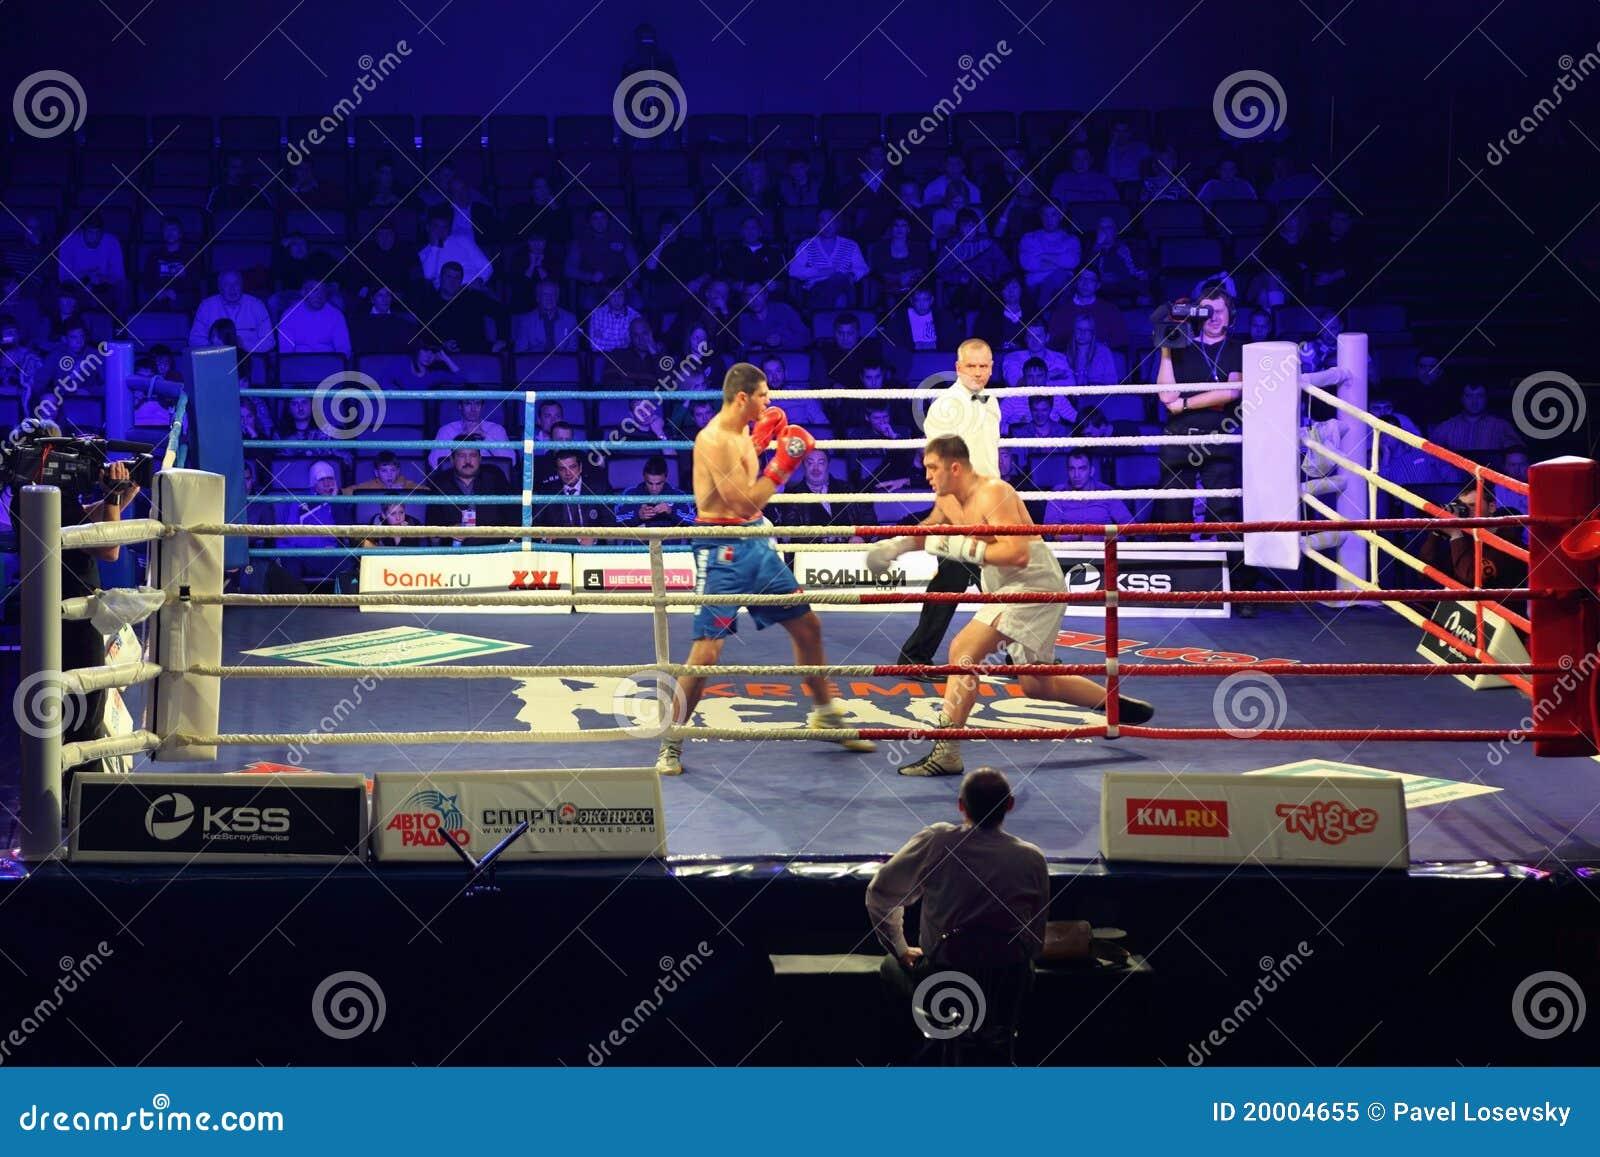 Bokswedstrijd I.Ismailov versus F.Khrgovich